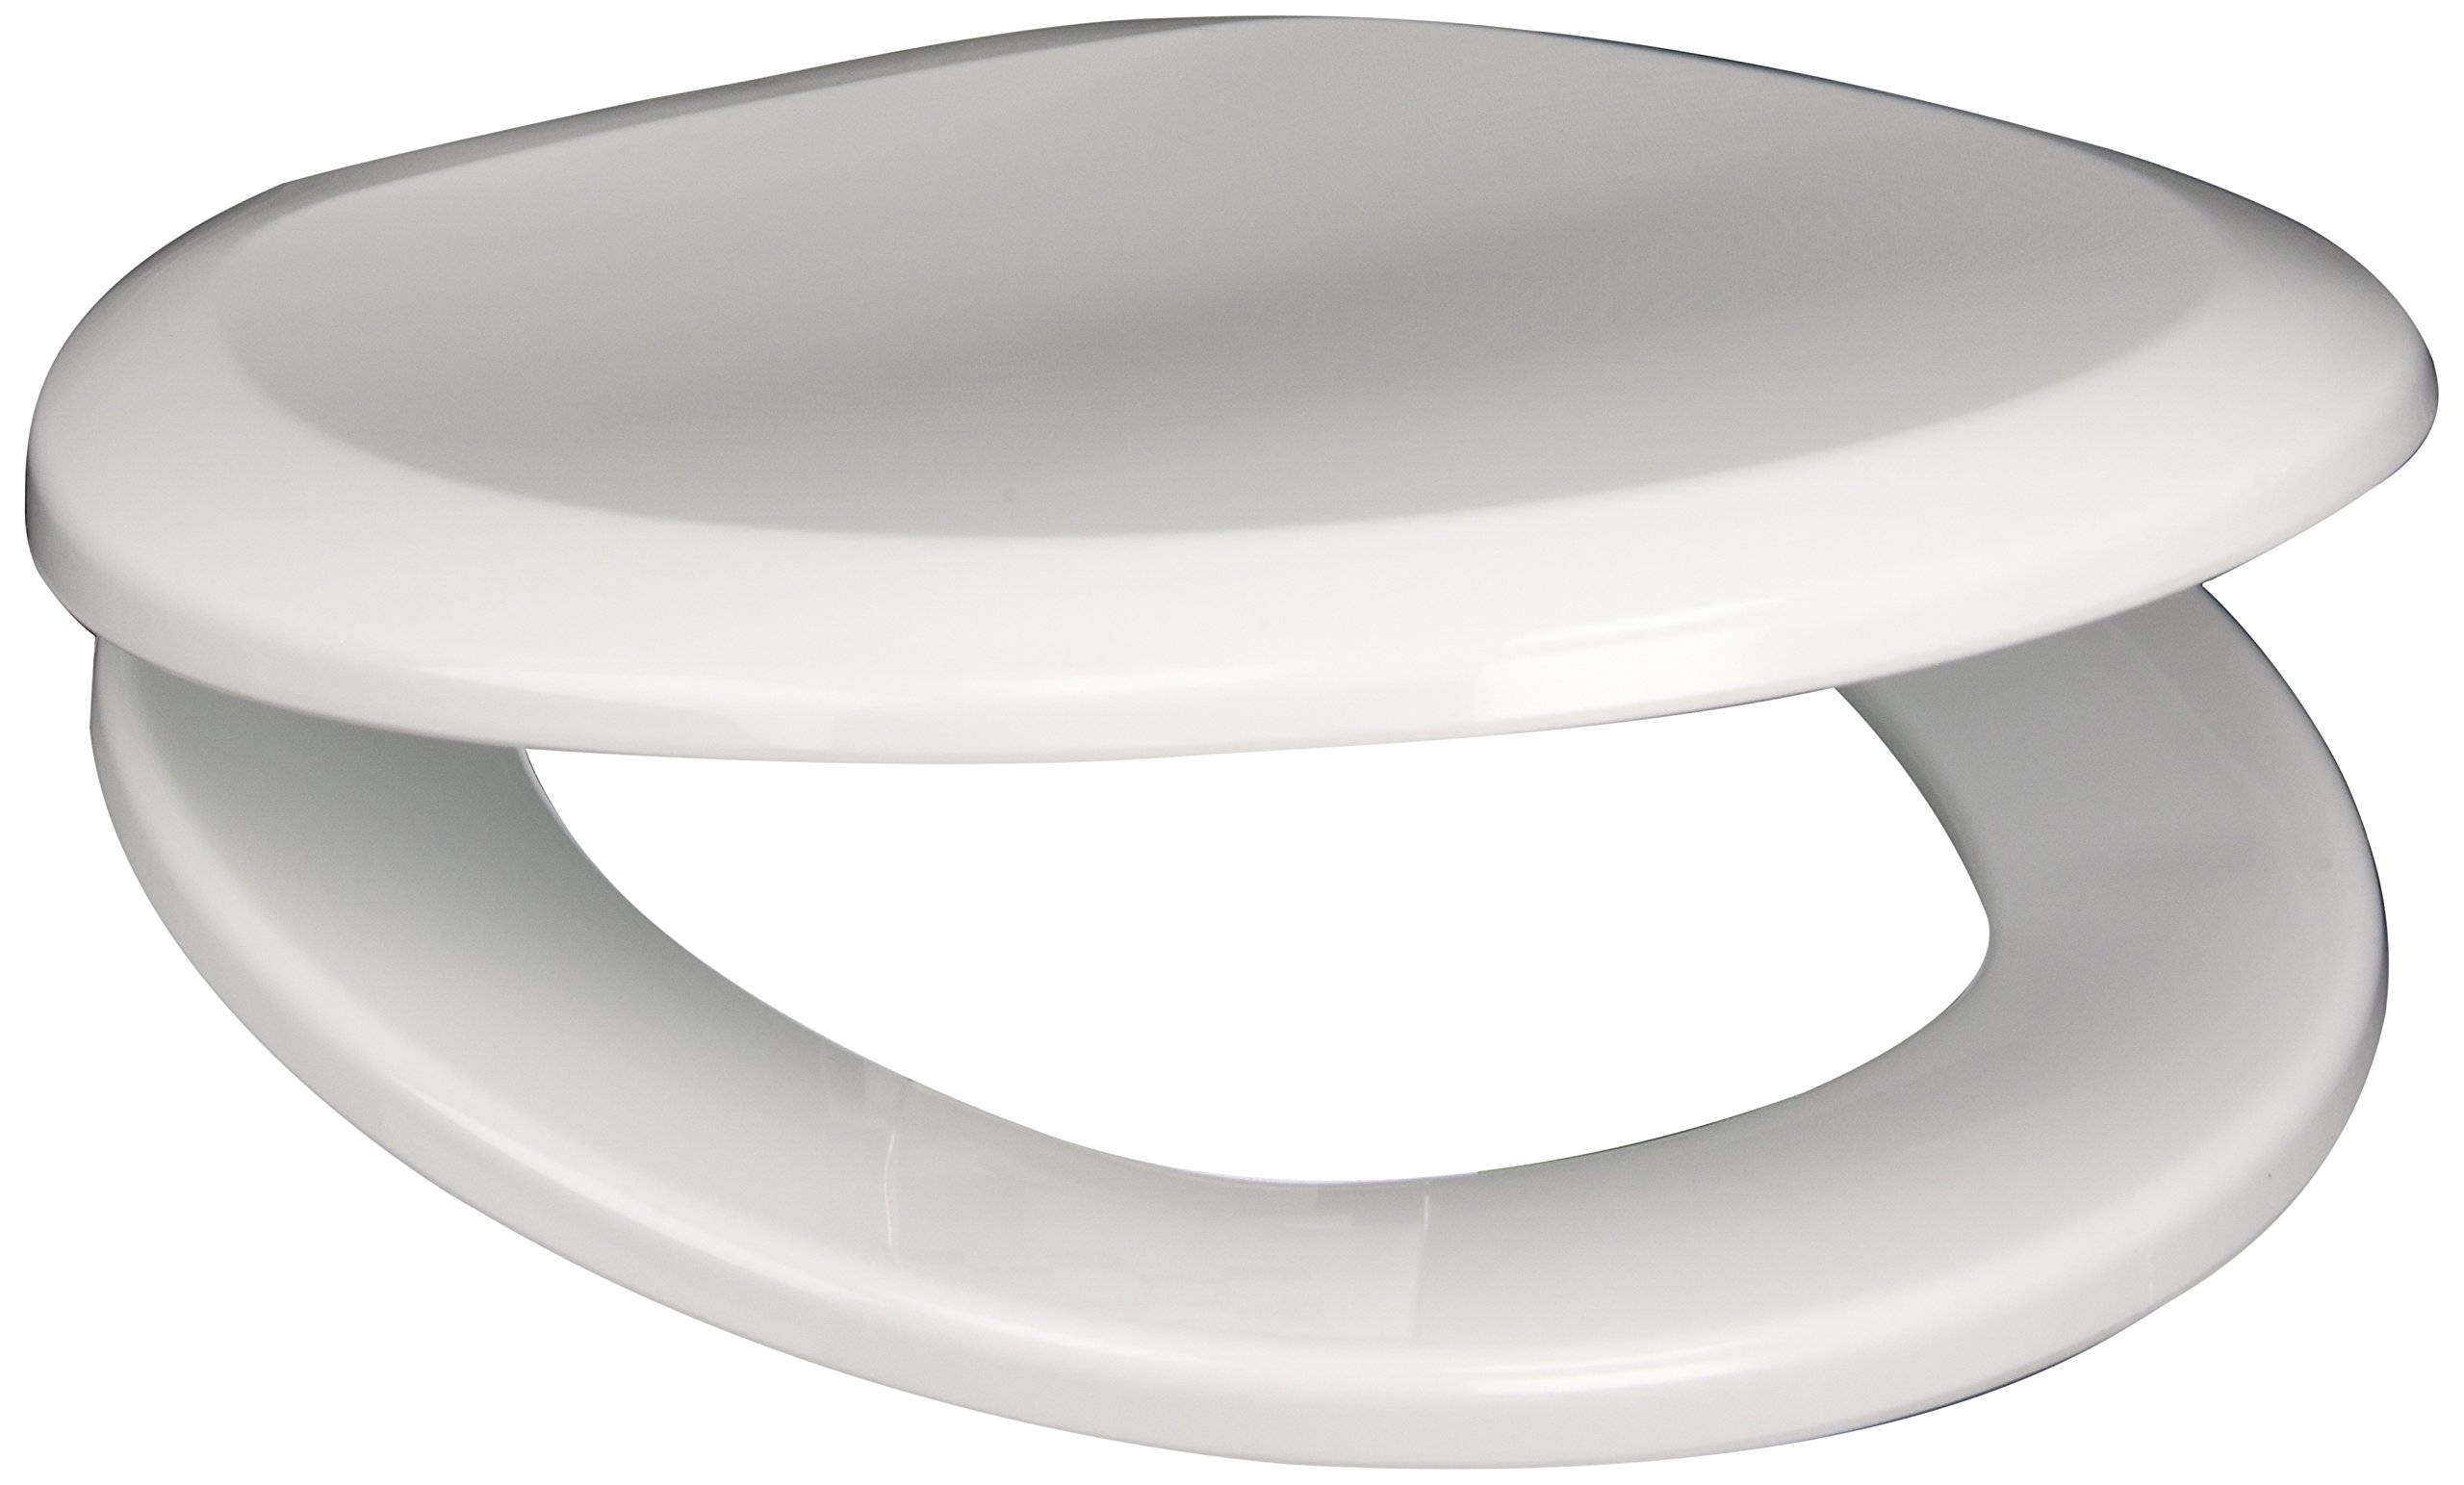 PlumbTech 260-04 Premium Slow Close Round Toilet Seat with Adjustable Hinge, Cotton White